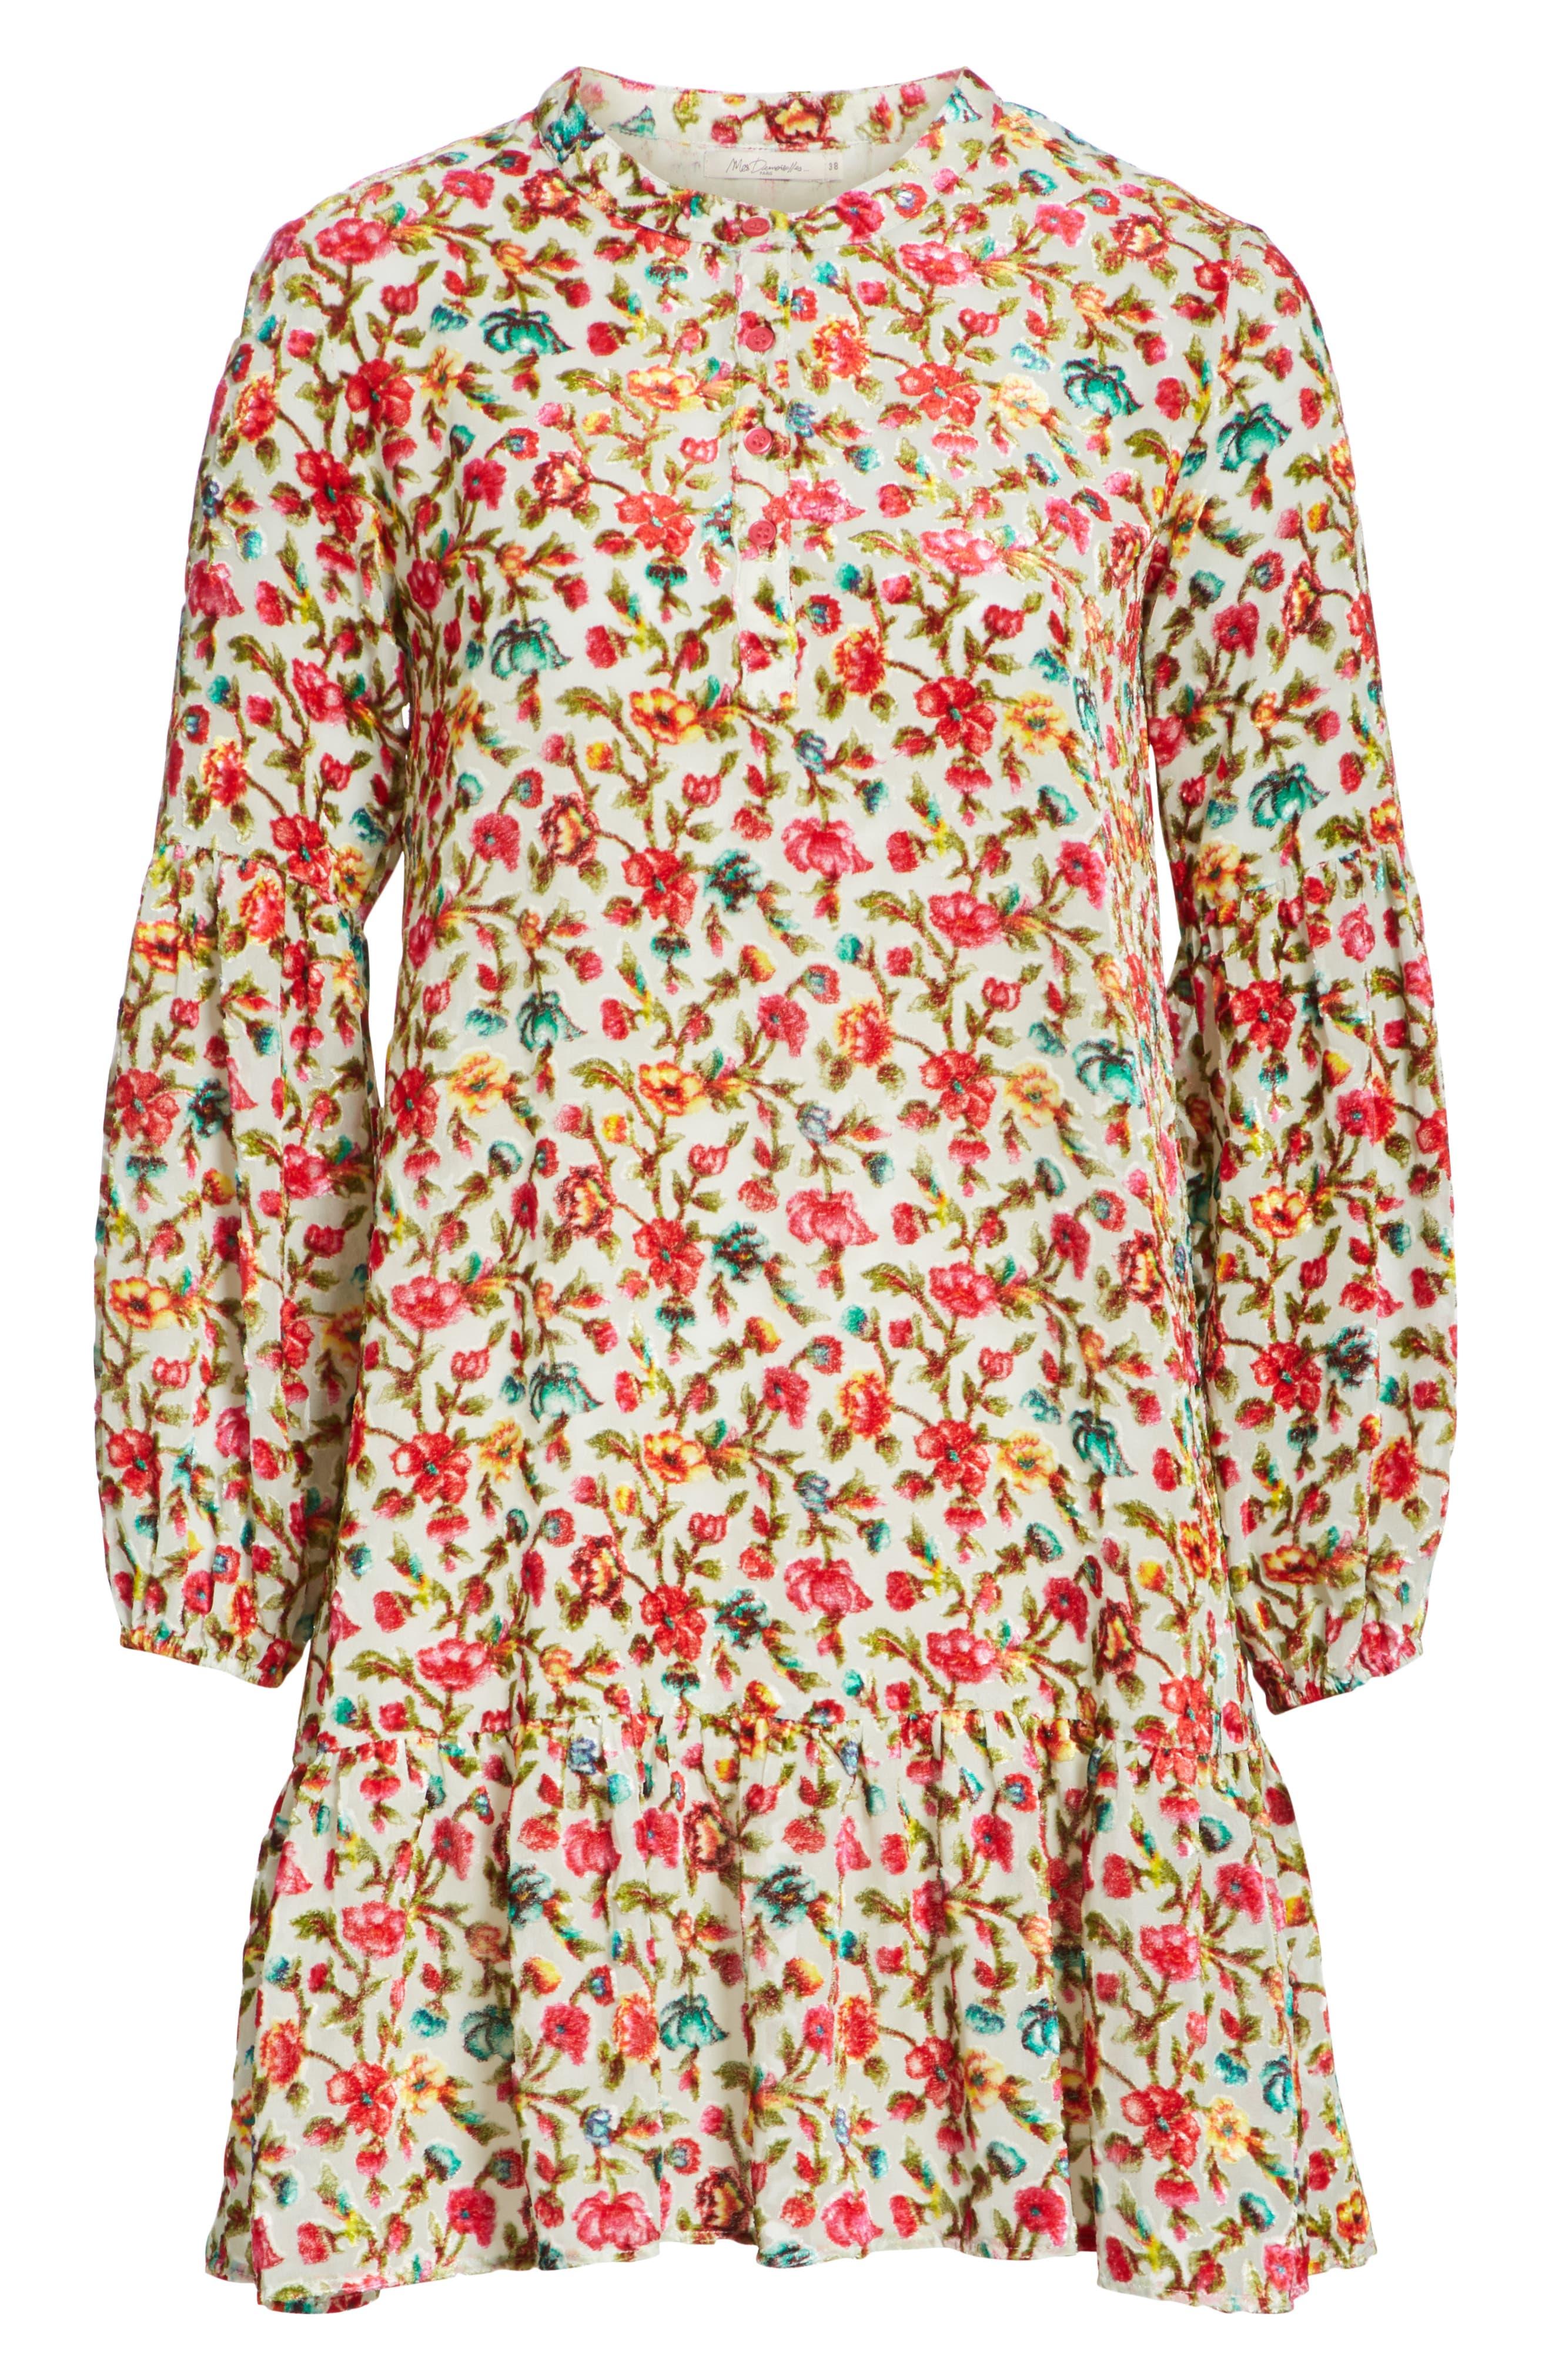 Simpson Printed Dress,                             Alternate thumbnail 6, color,                             693